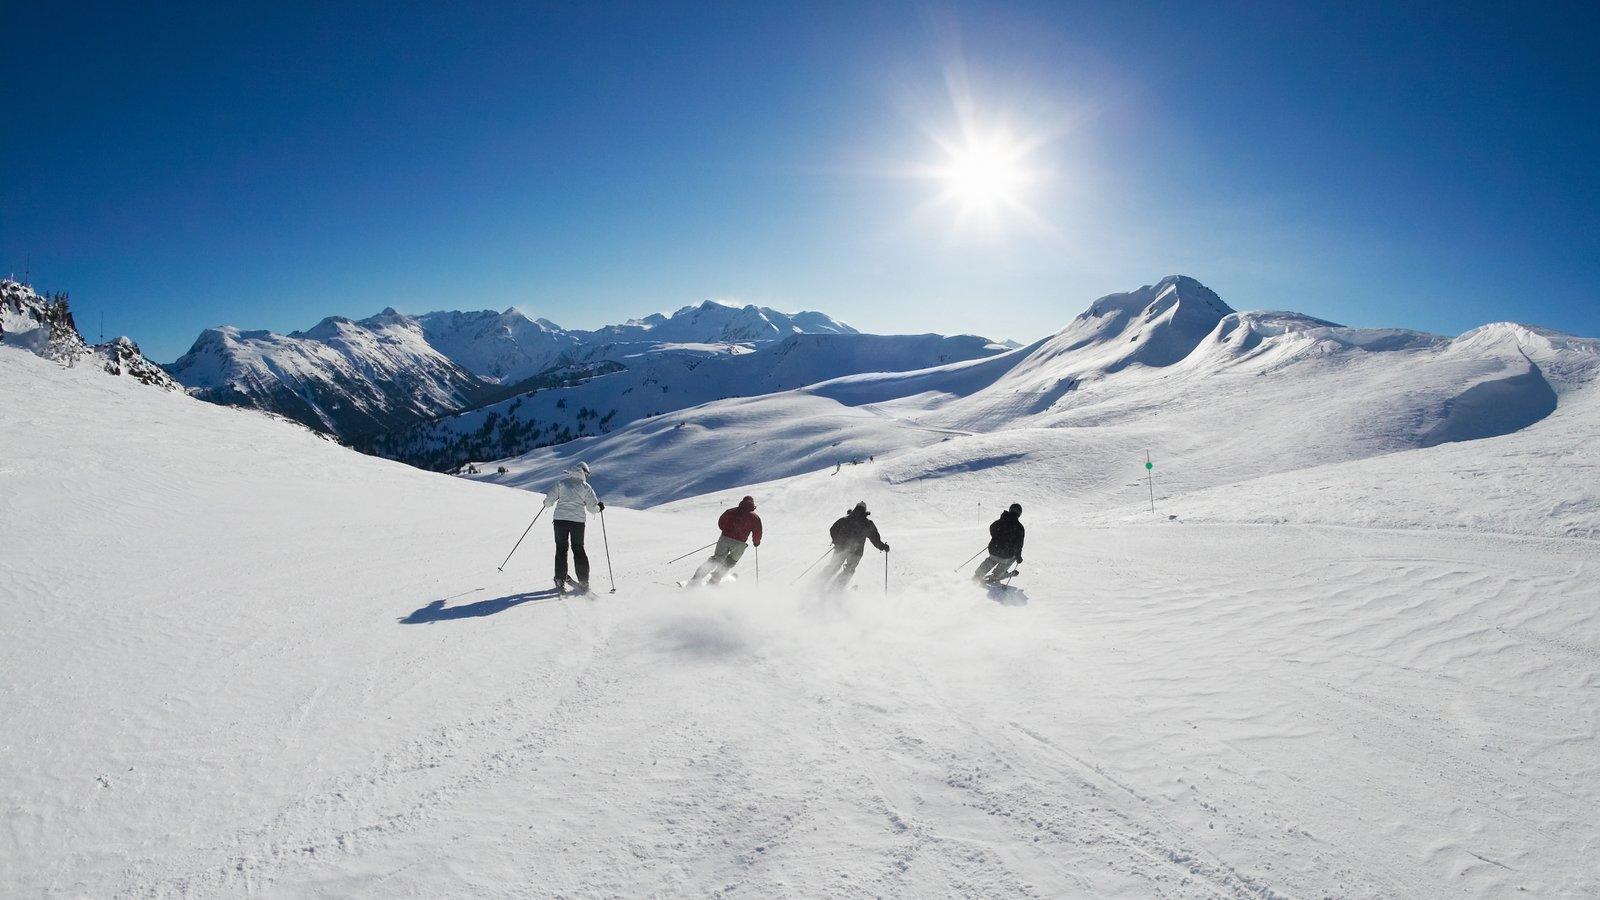 Whistler Blackcomb Ski Resort showing mountains, snow and views